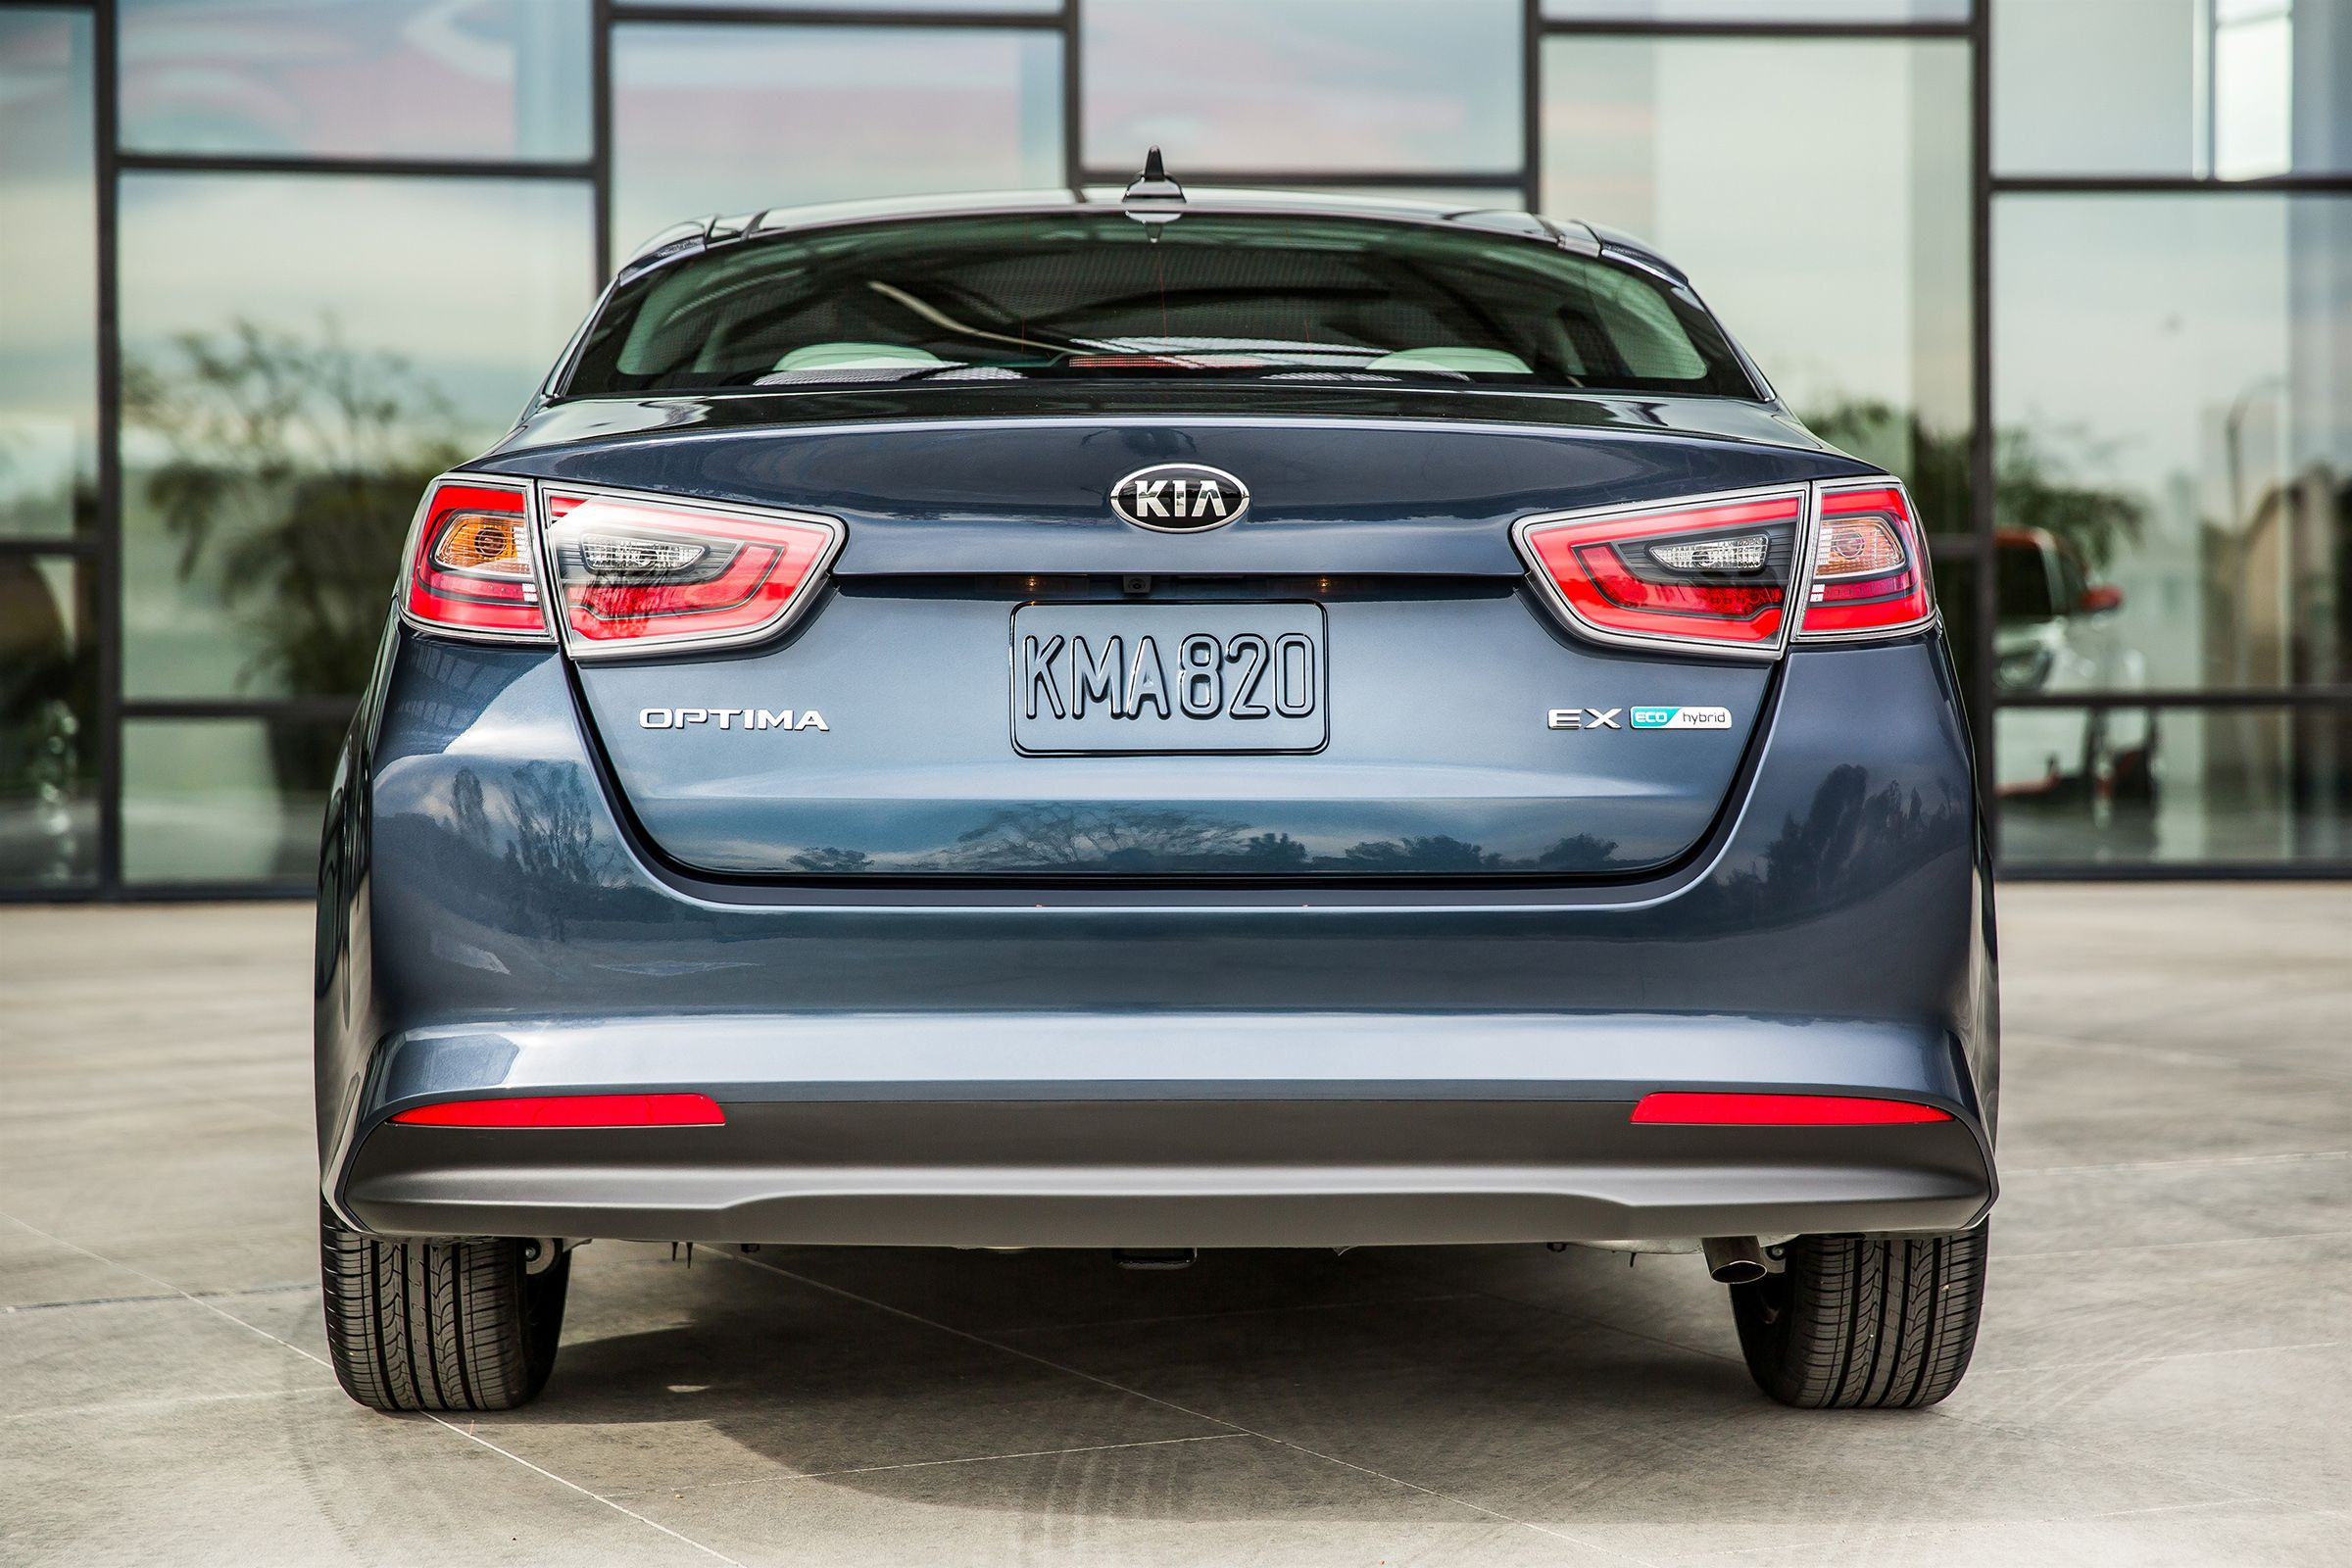 new hybrid kia auto for used sale optima trader cars saloon